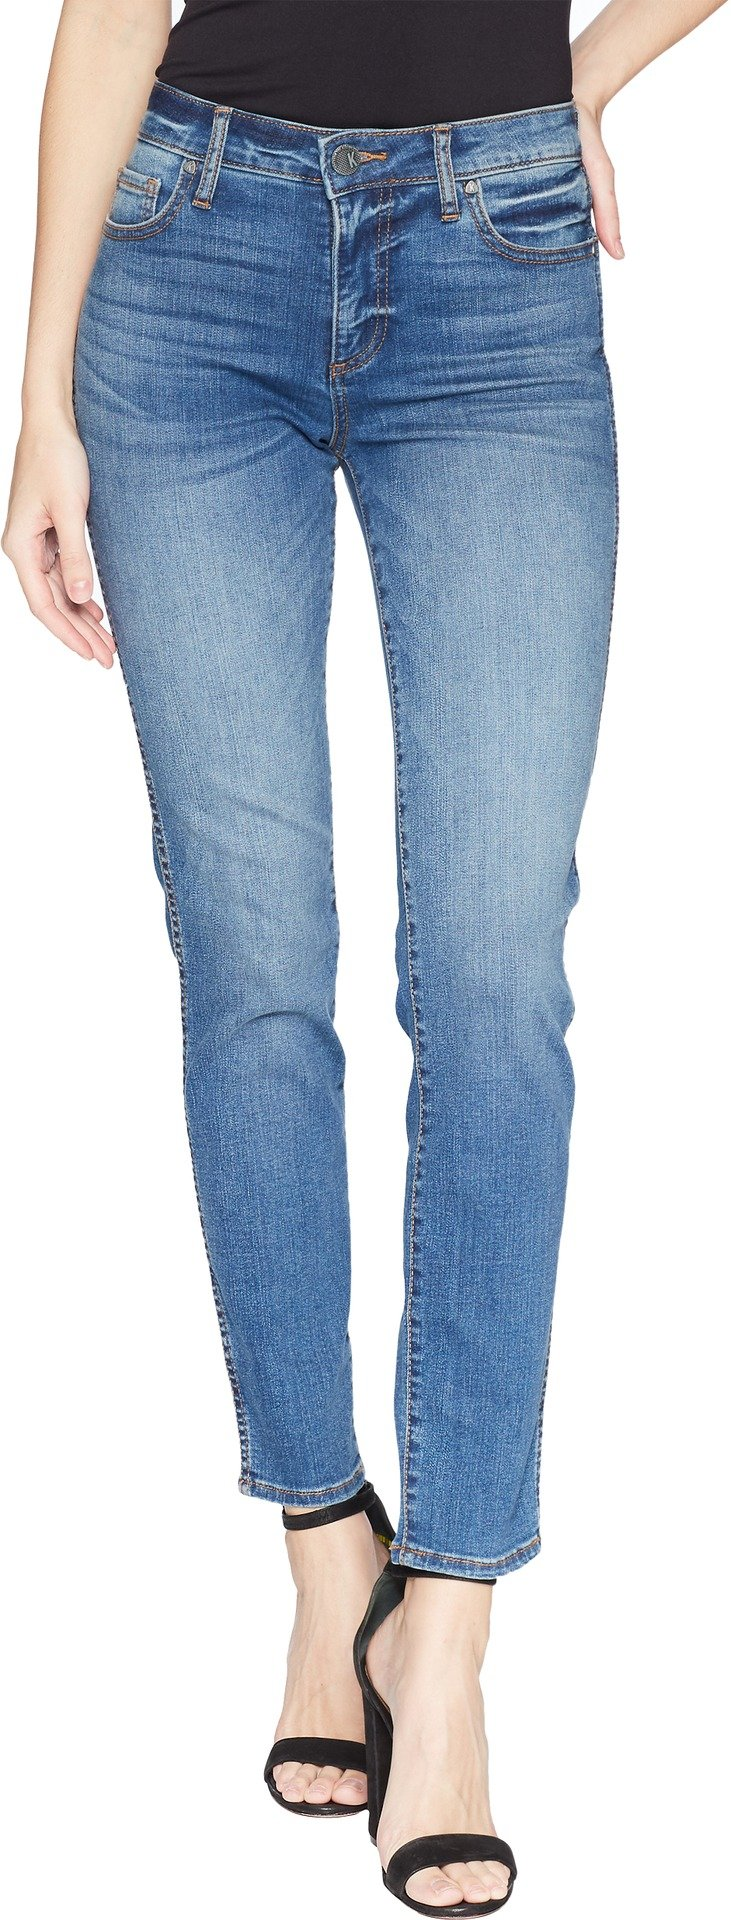 KUT from the Kloth Women's Diana Fabric Ab Skinny Legs Five-Pocket in Meditate Meditate 8 30